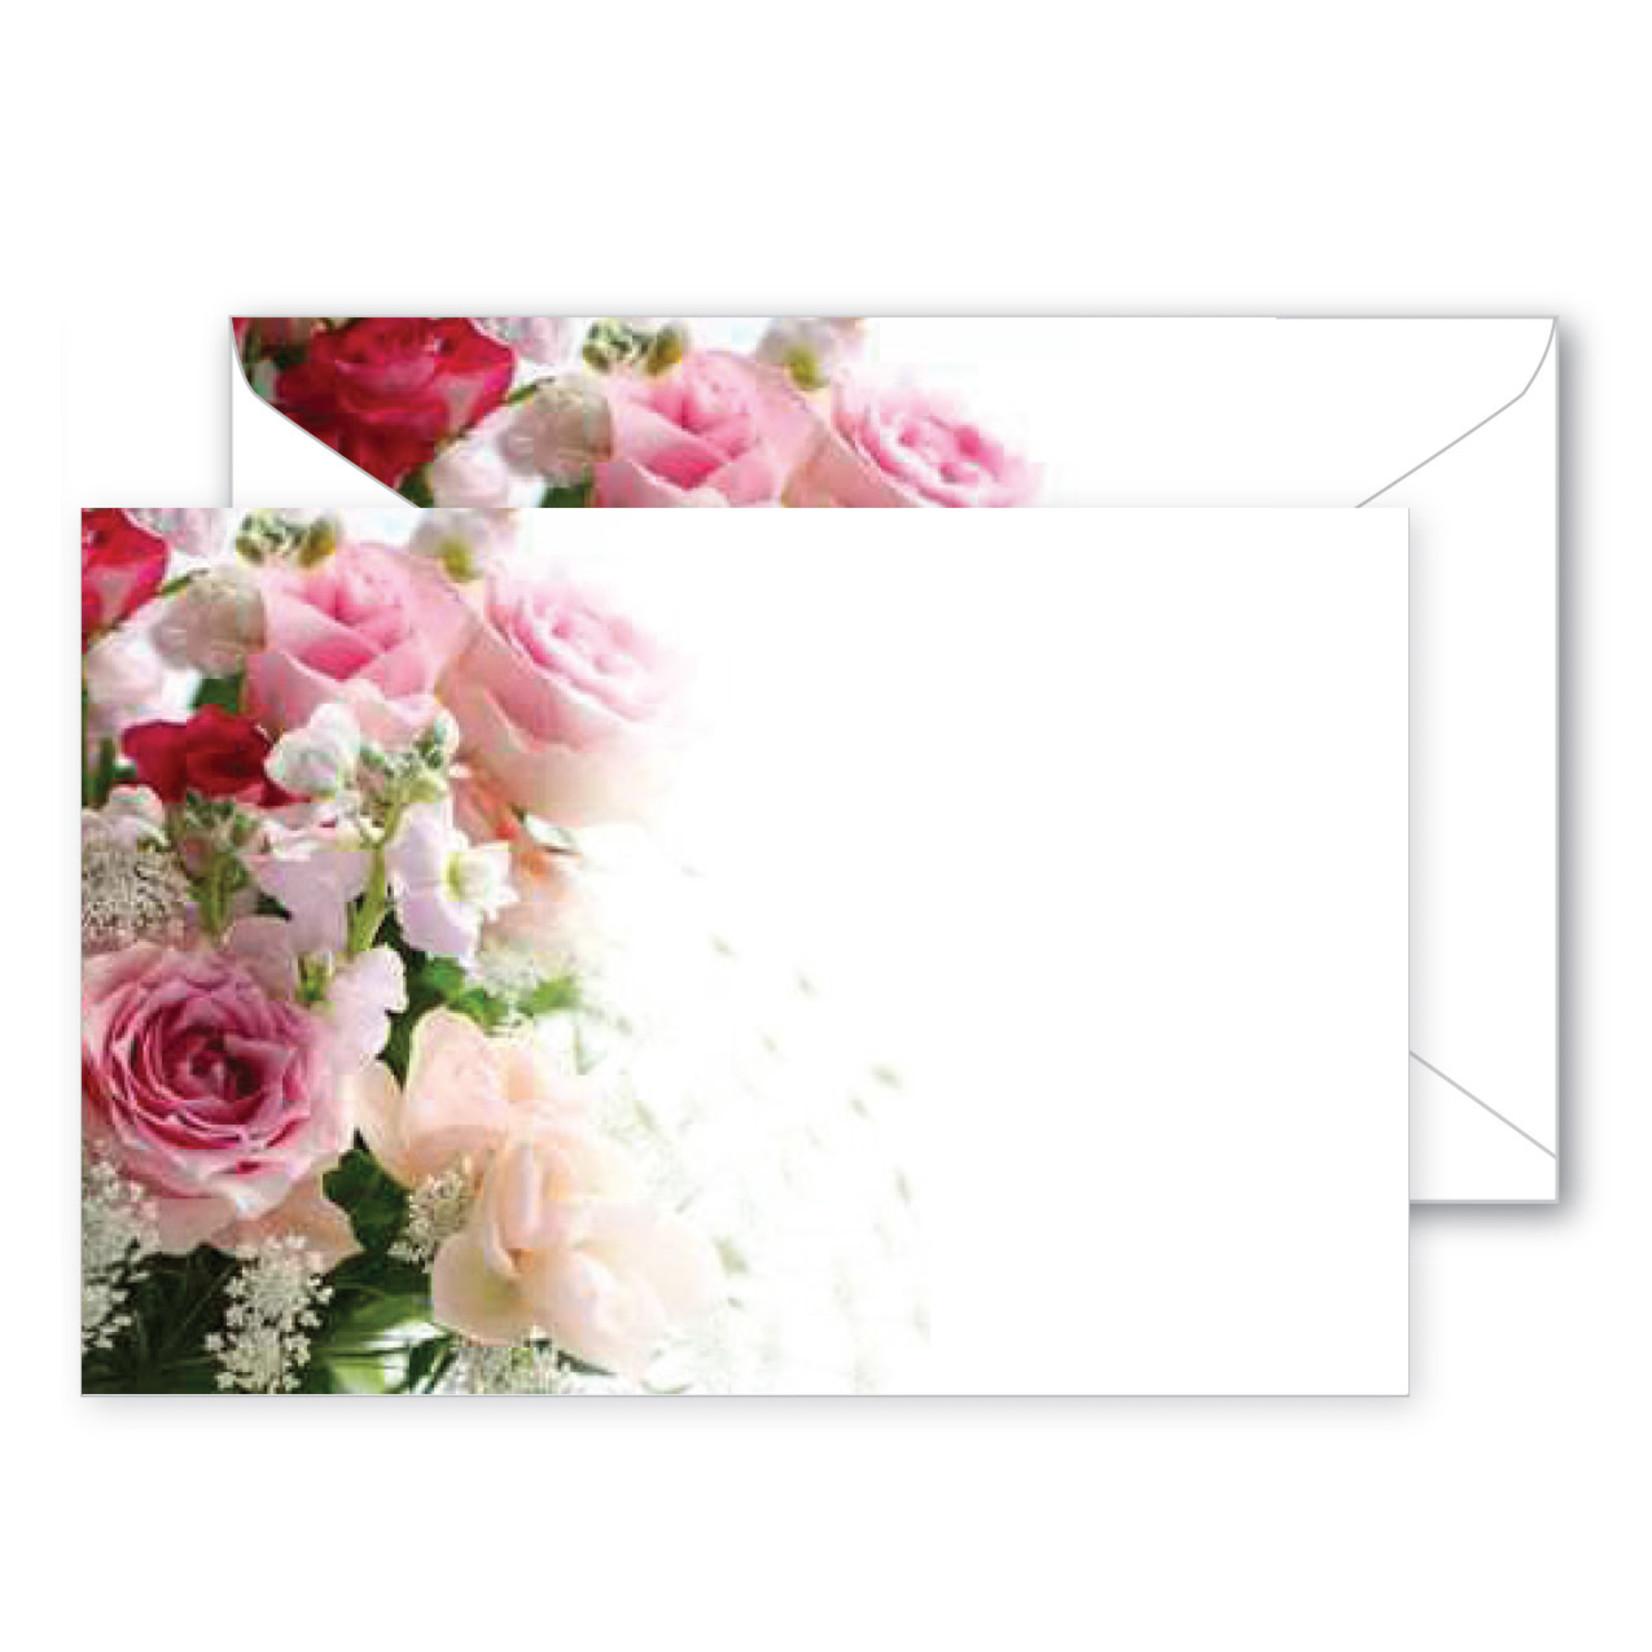 4.5 x 3 Rose Photography box ENVELOPE